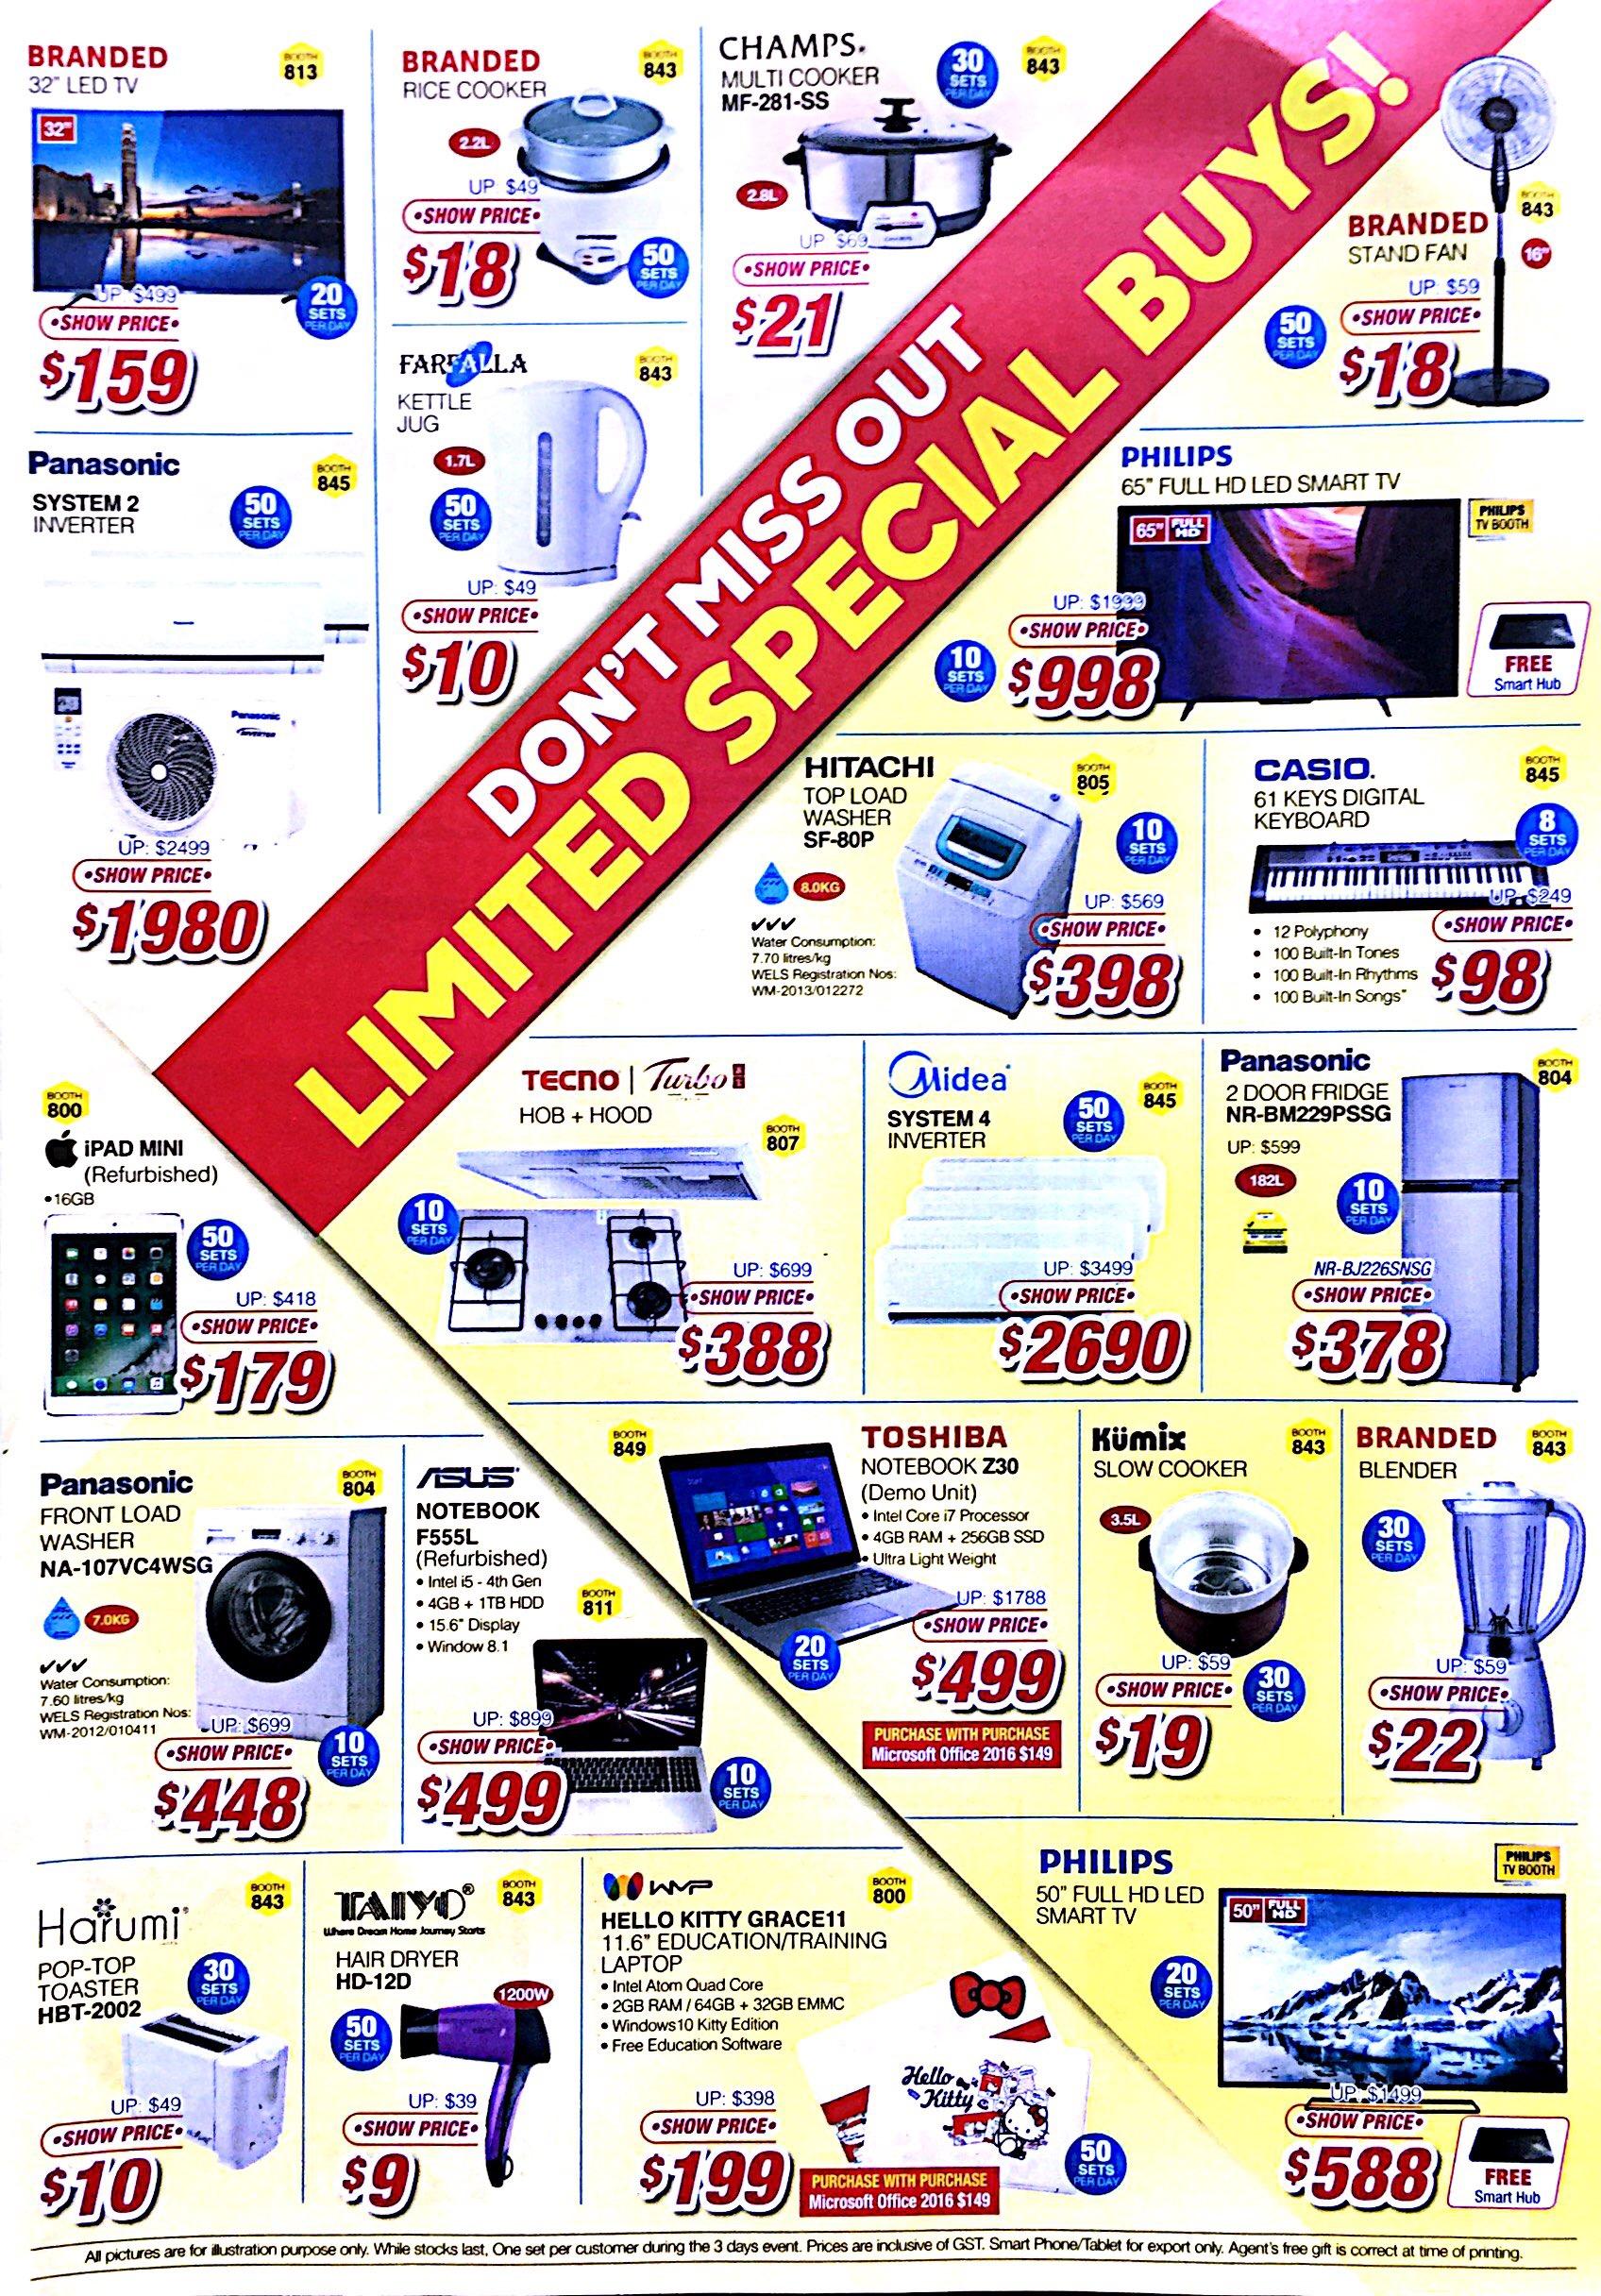 Consumer Electronics Expo 2017 | 20-22 Oct | Singapore expo | pg4